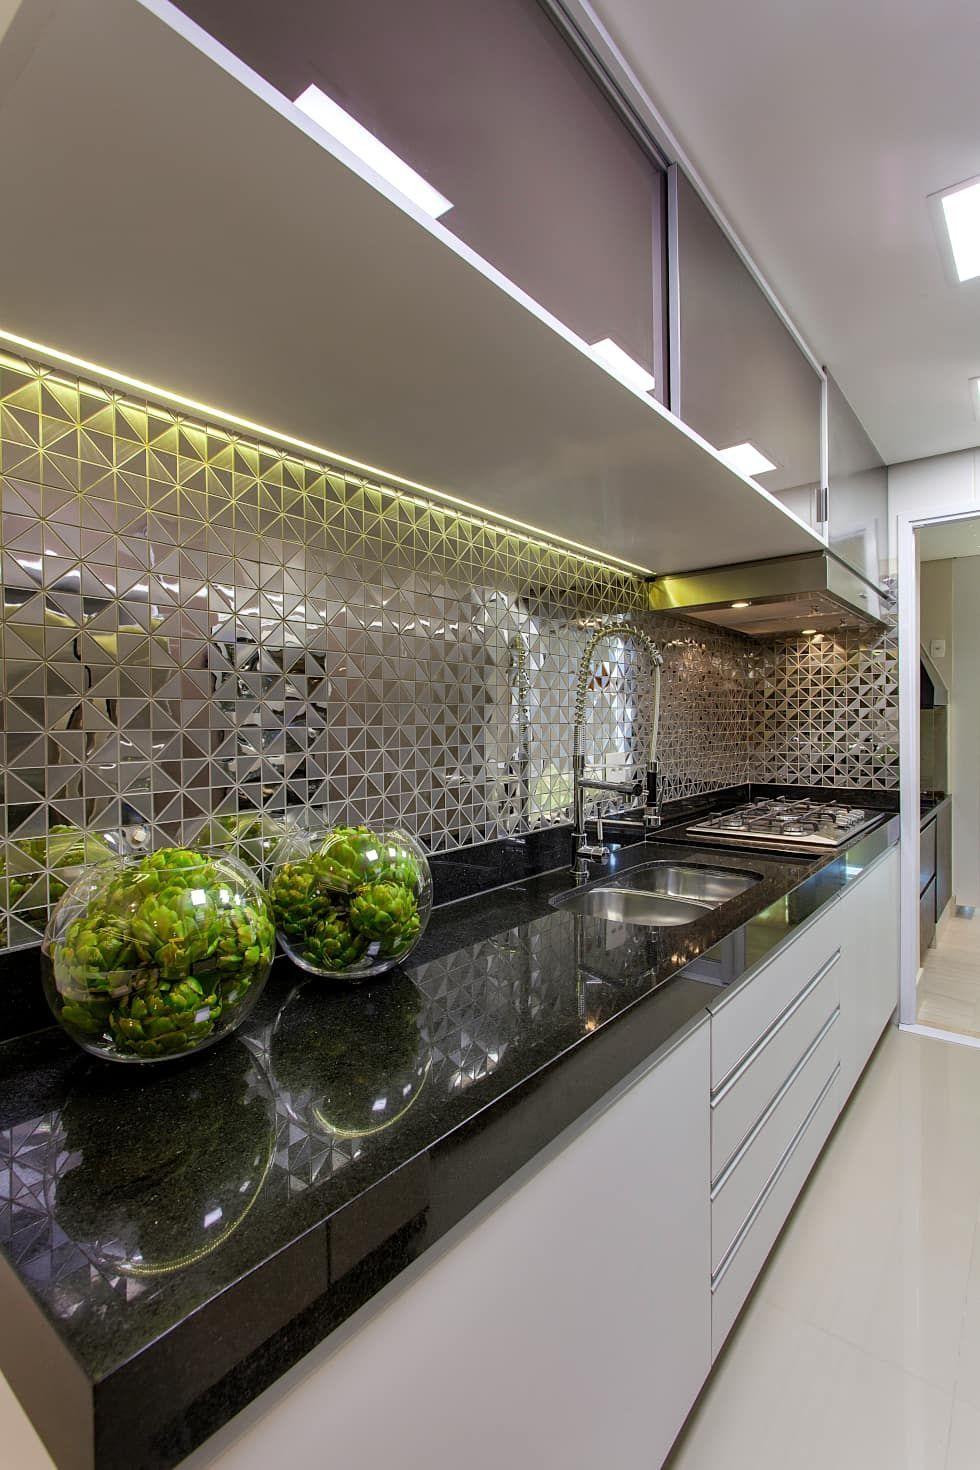 25 Best Kitchen Lighting Ideas Fixtures Over Island Kitchen